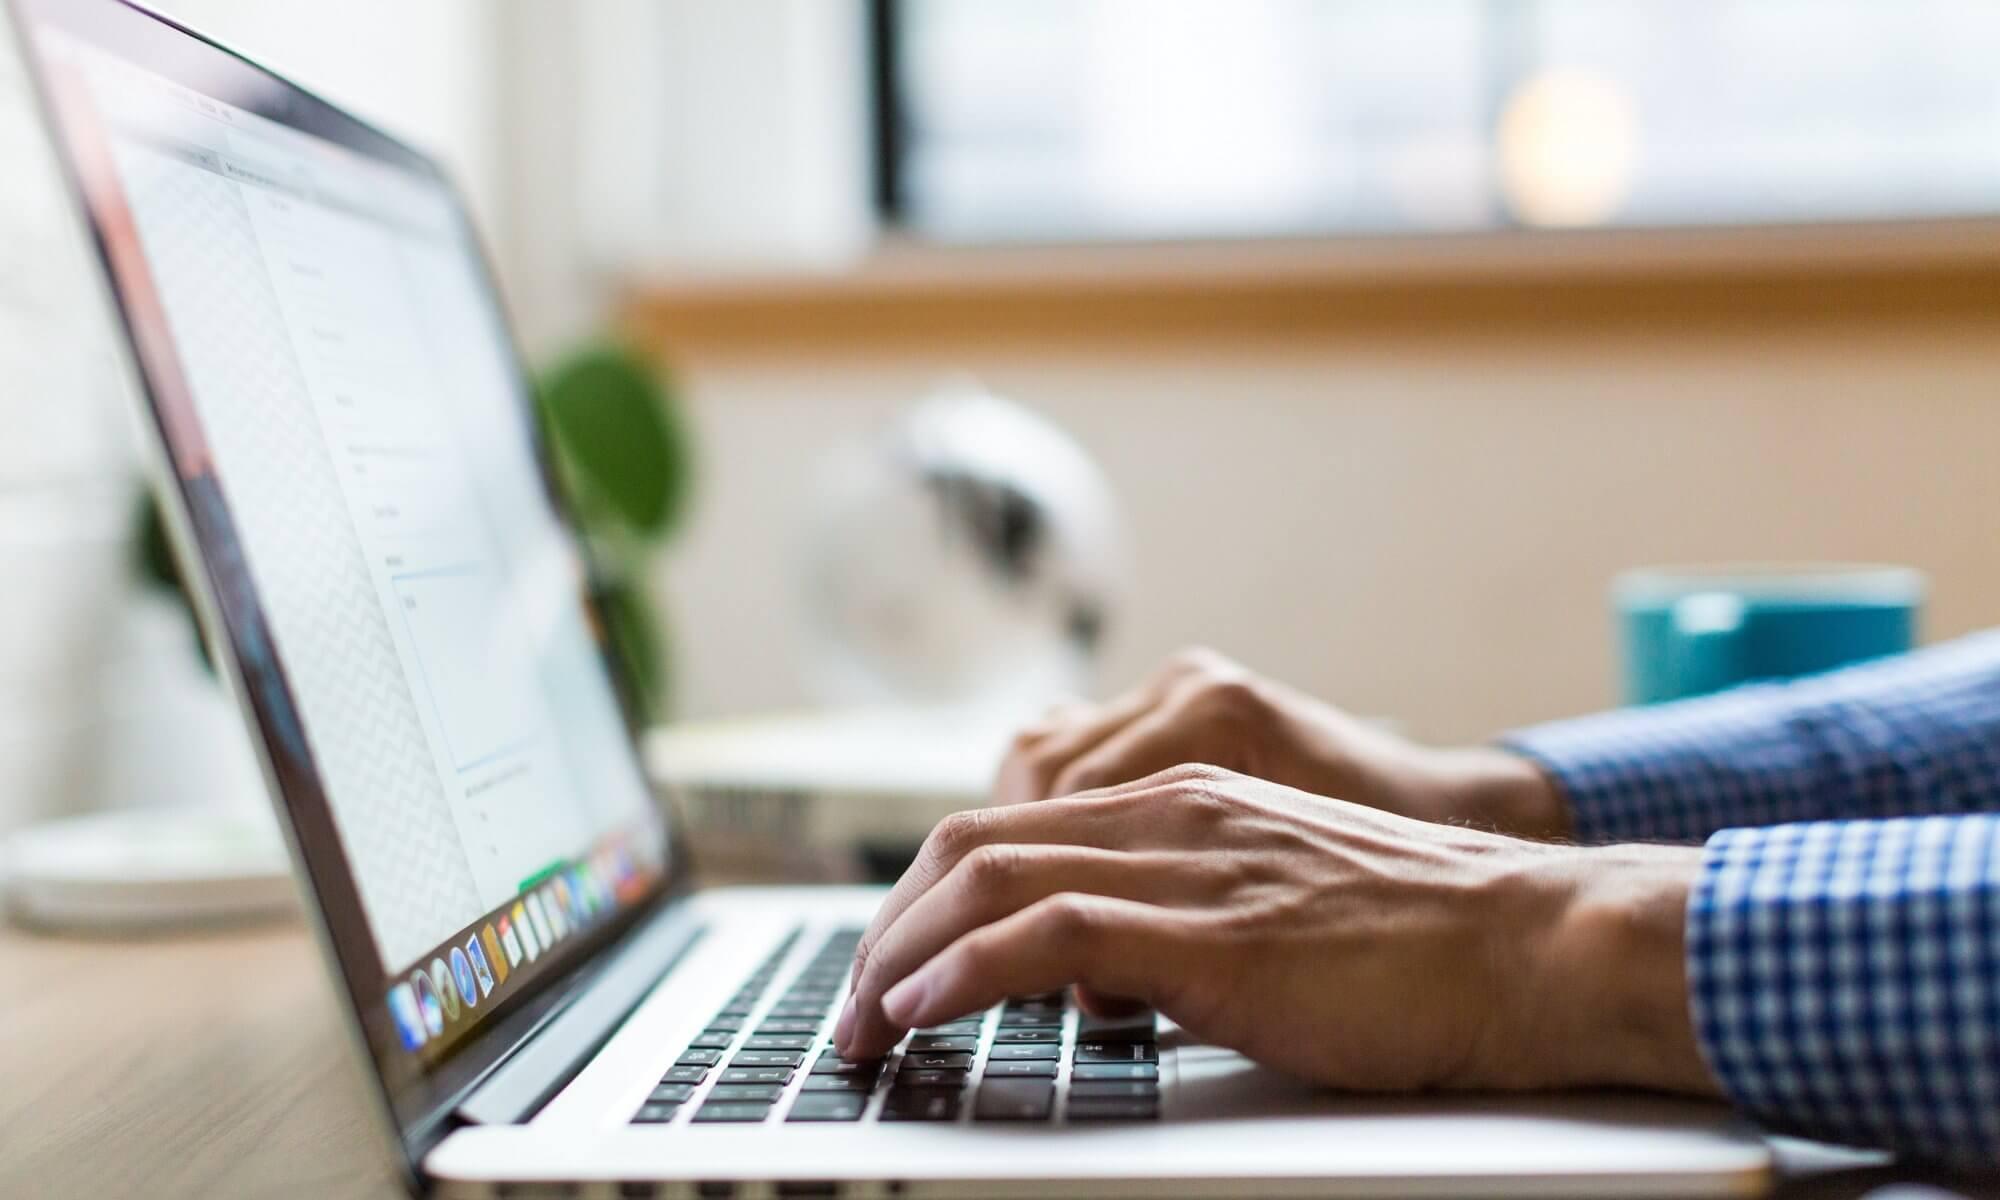 seo copywriting workshop | seo schrijven opleiding